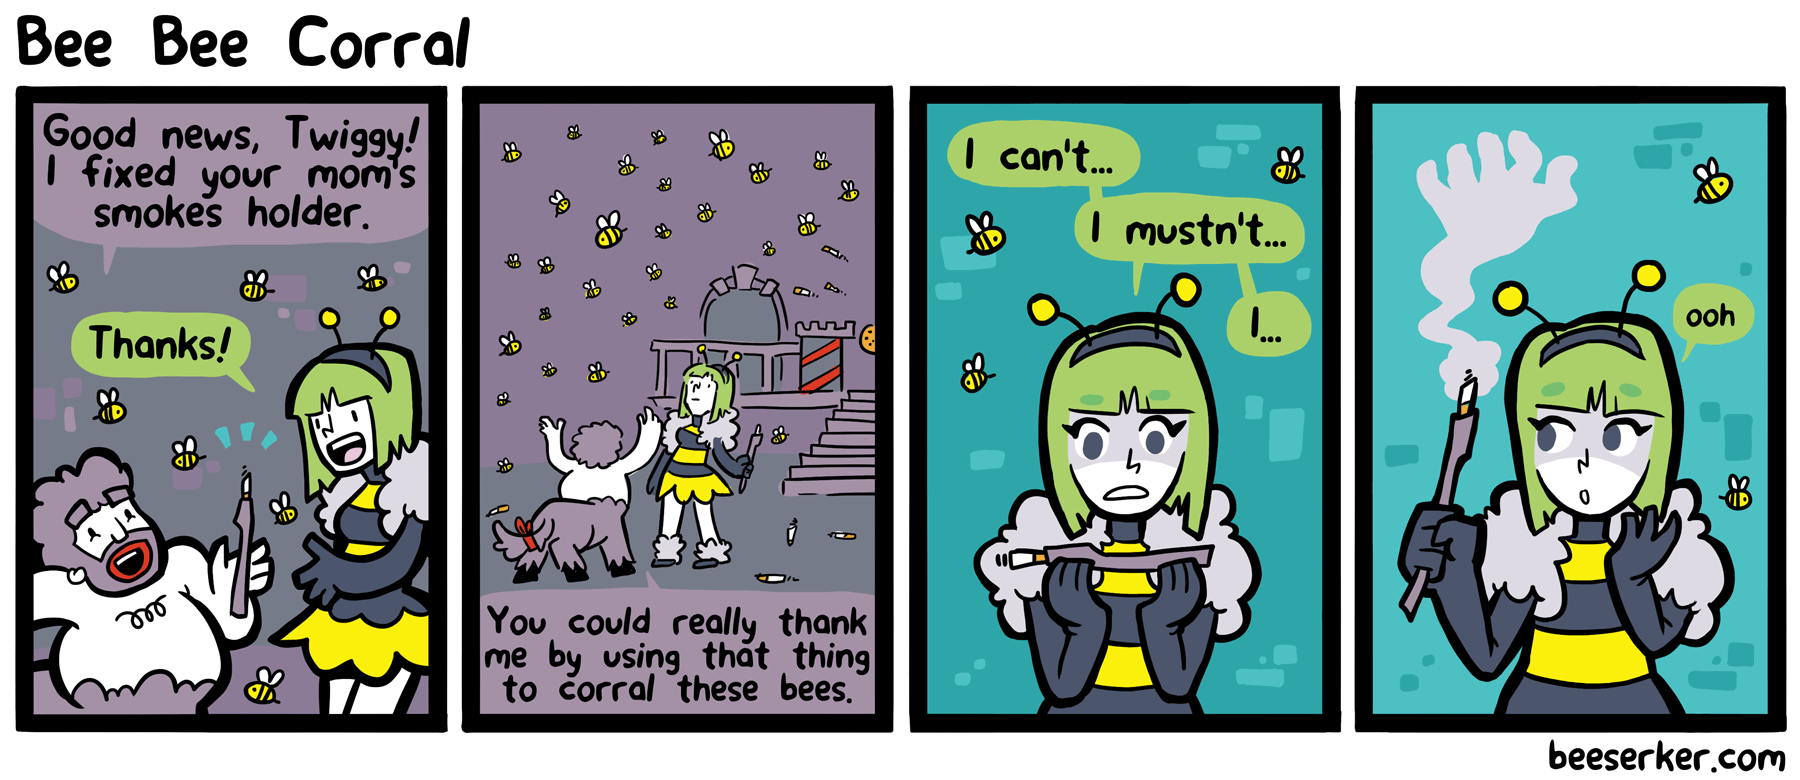 Bee Bee Corral